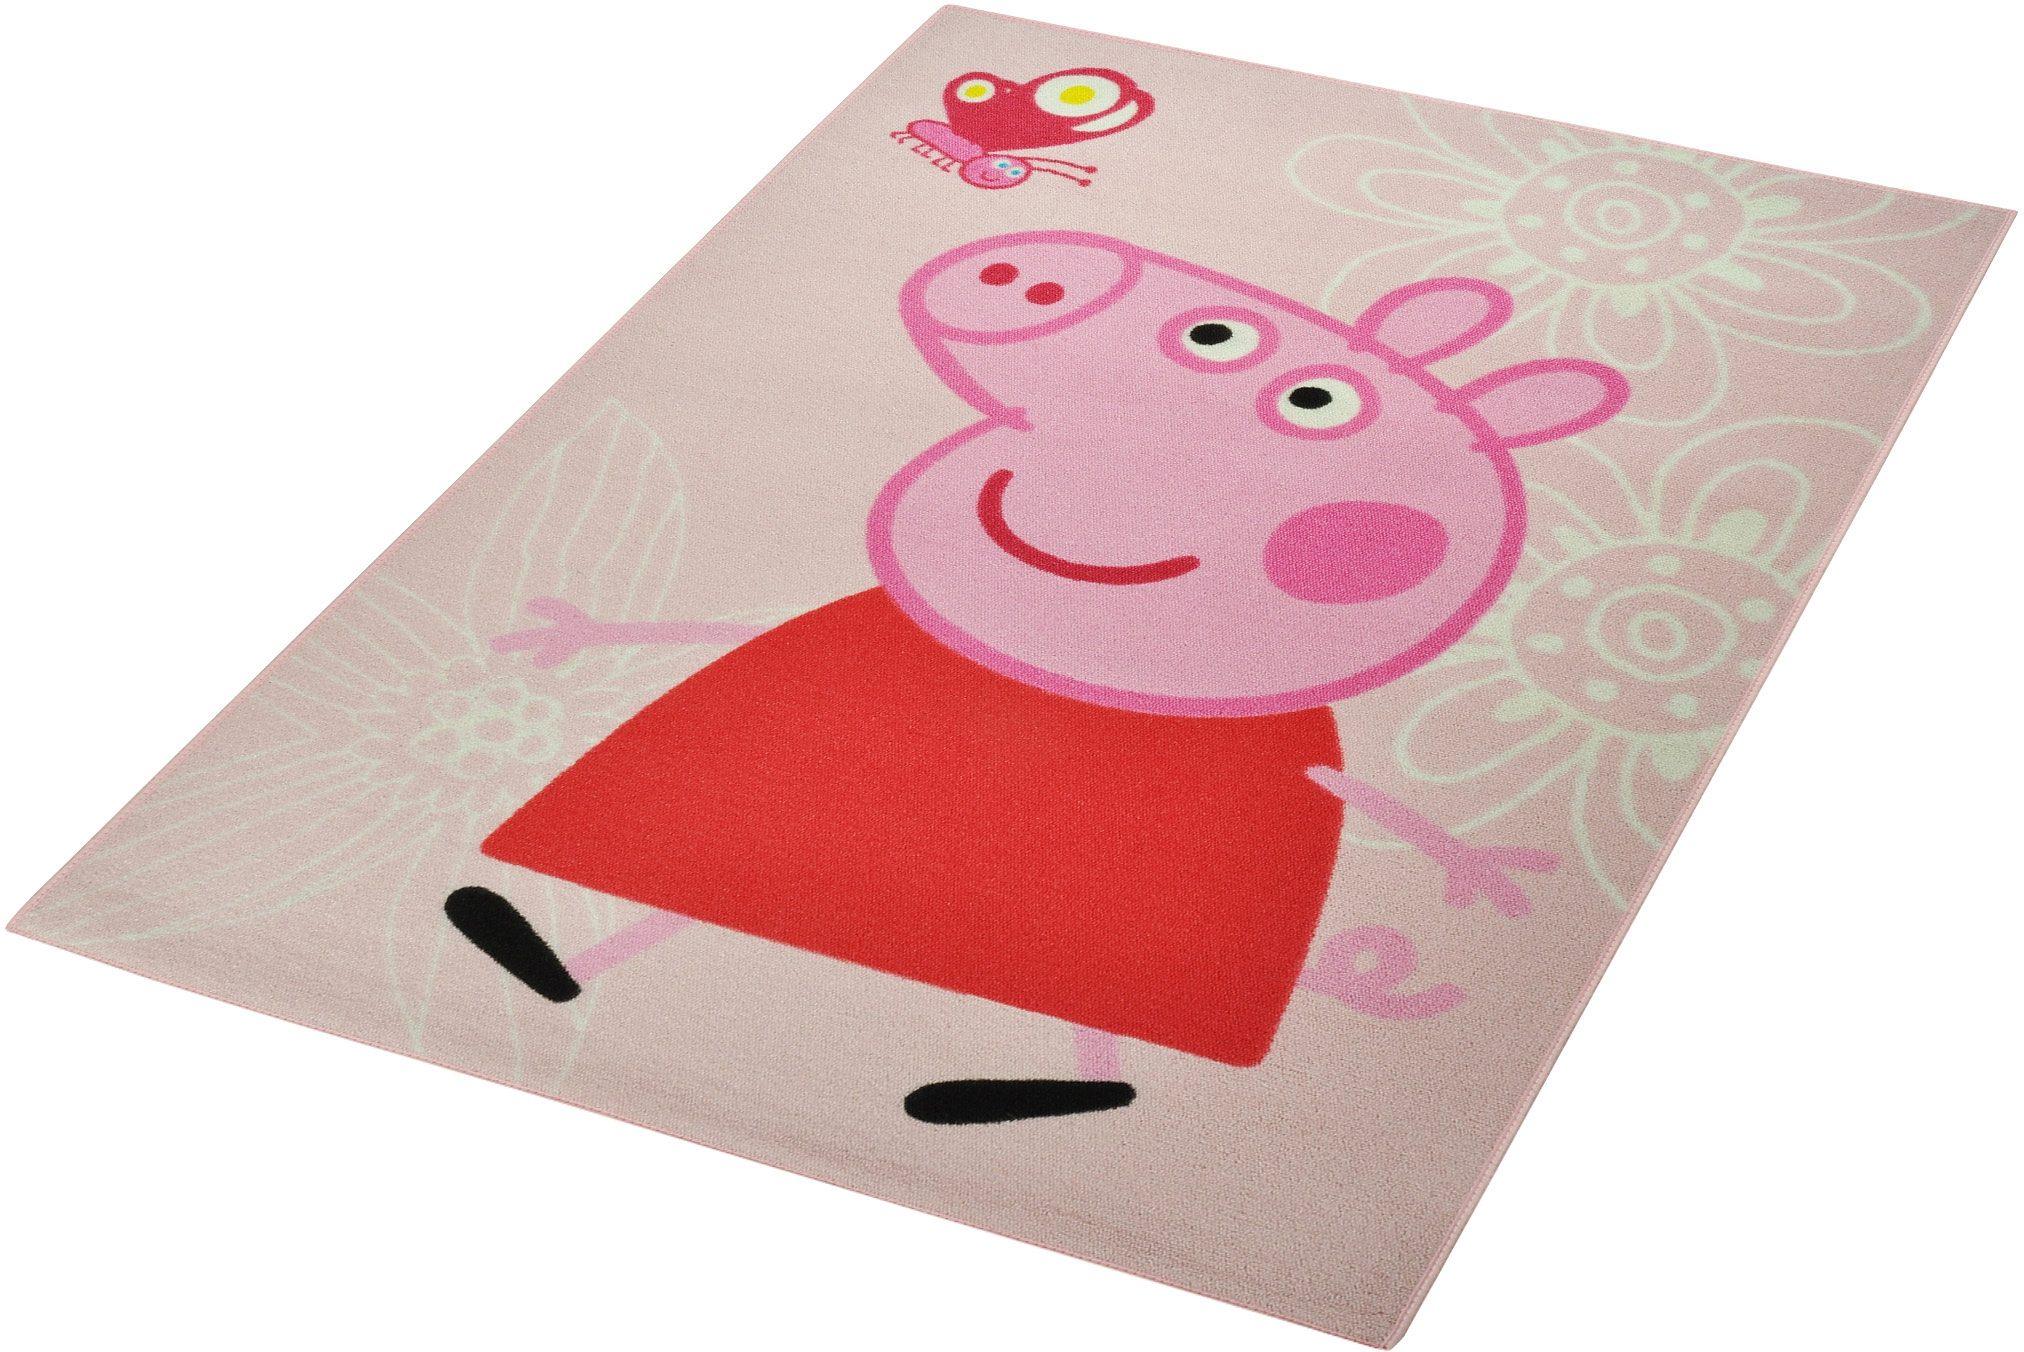 Teppich Schmetterling Rosa ~ Kinderteppich lizenz peppa pig schmetterling« hanse home